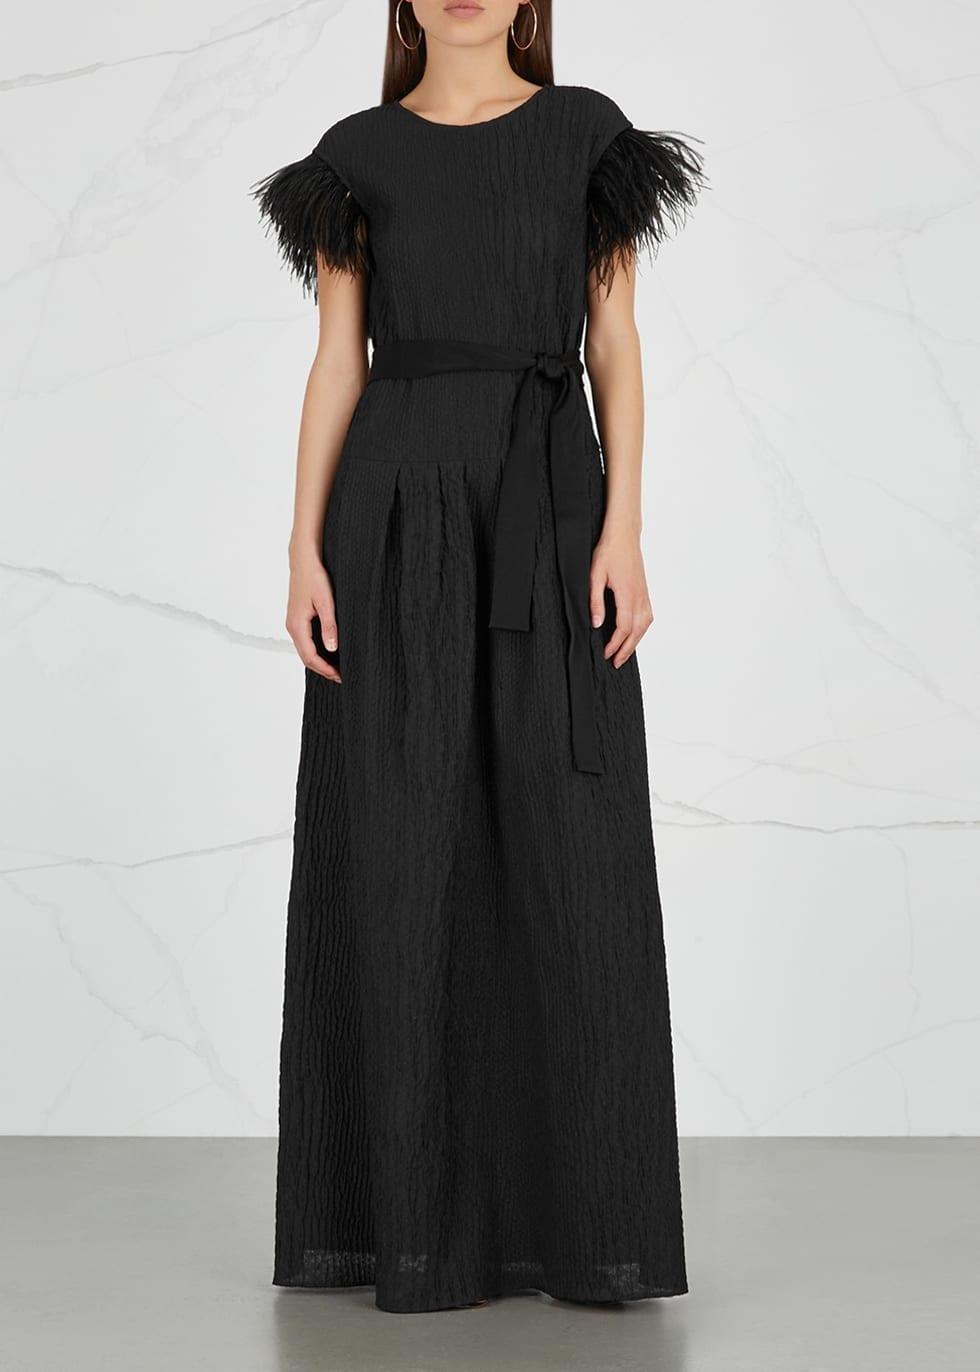 PAULE KA Feather Embellished Organza Black Gown - We Select Dresses